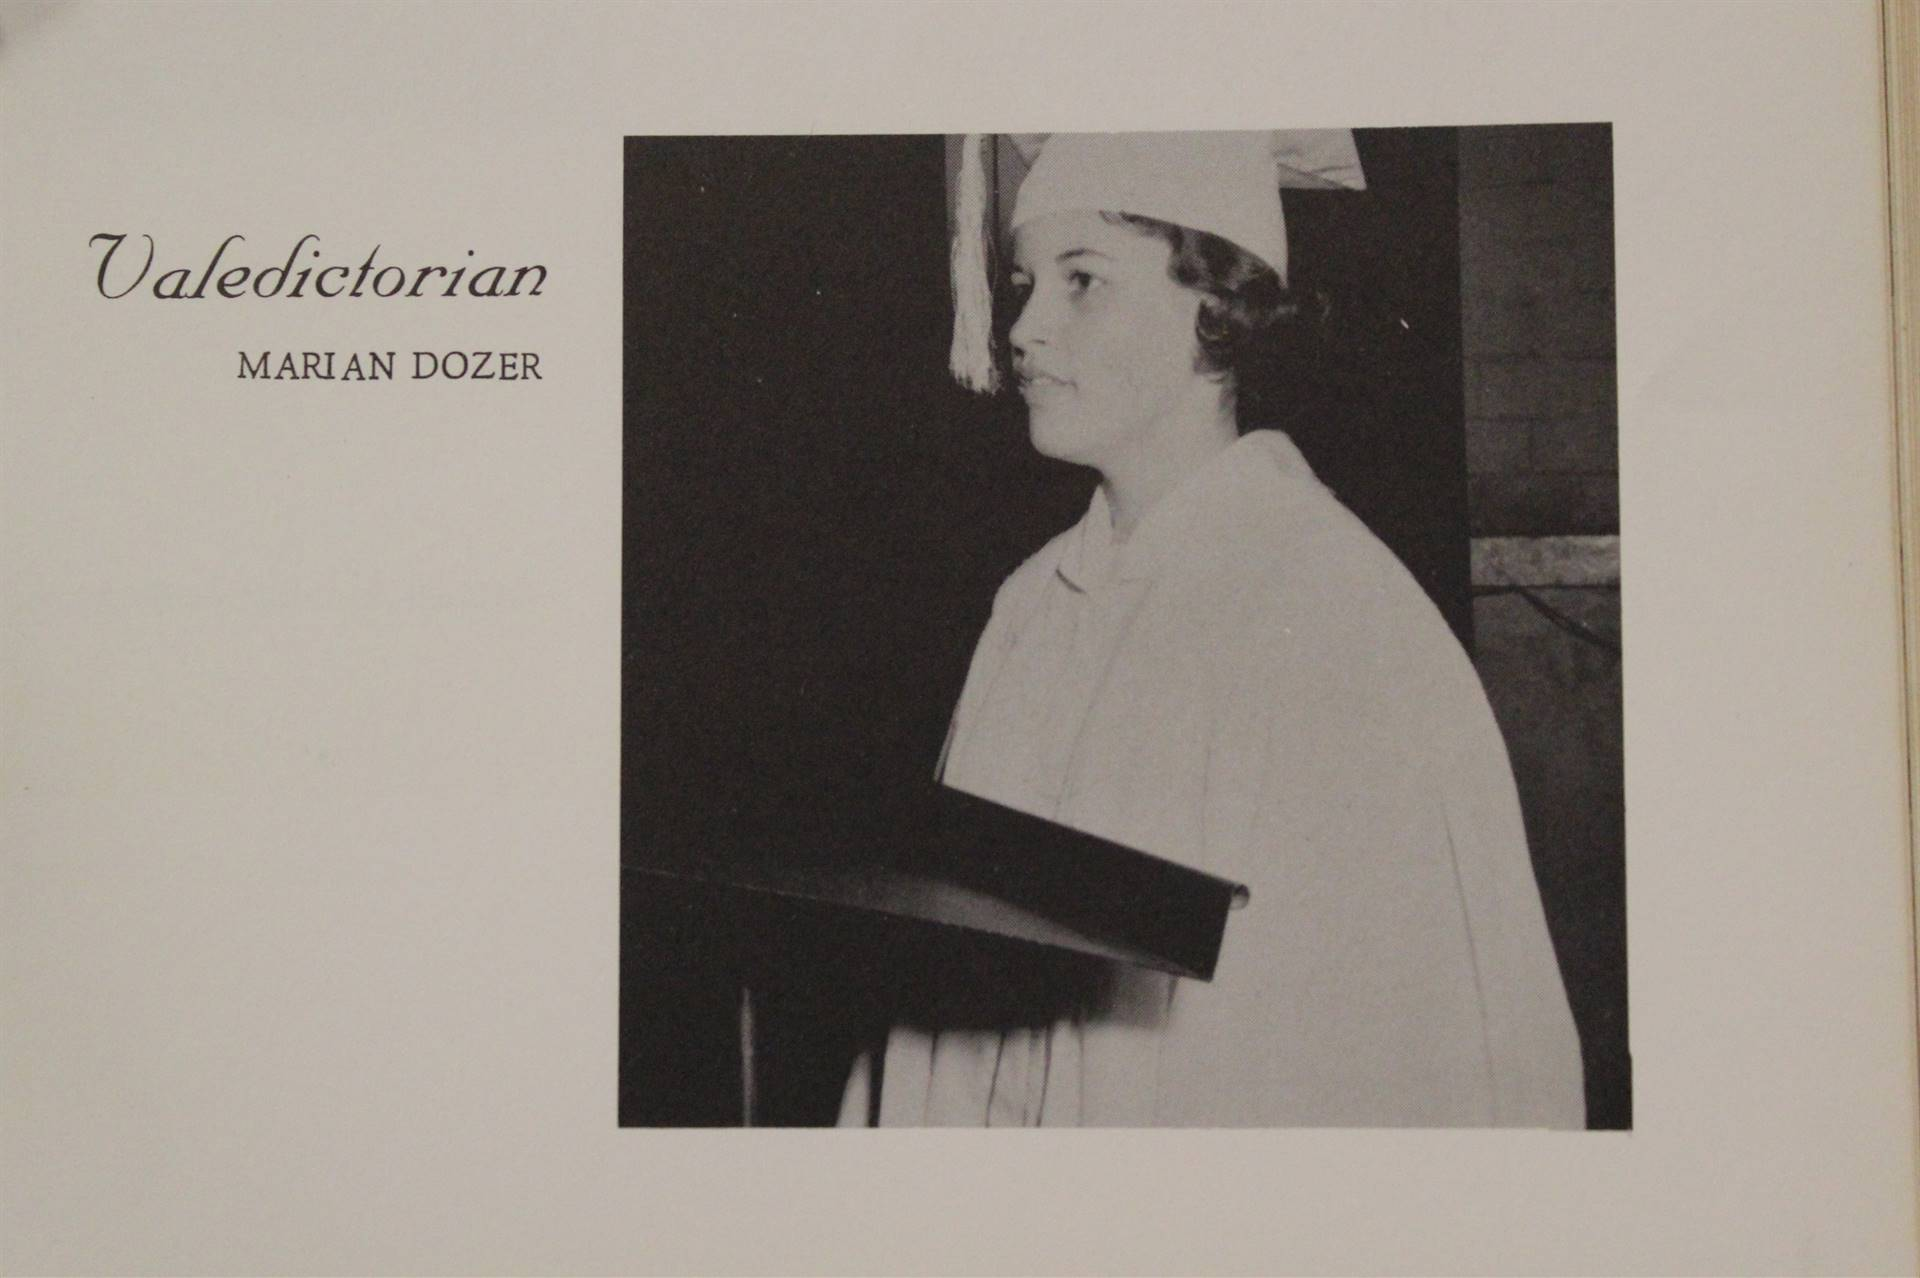 1960 Valedictorian